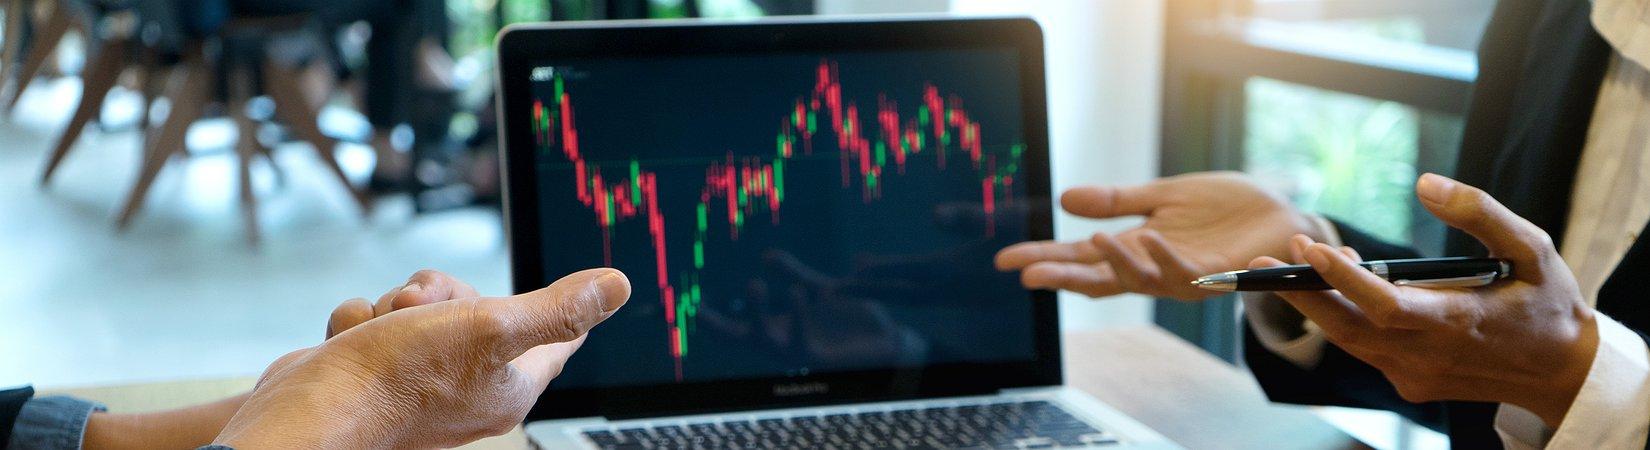 Анализ рынка криптовалют 10.01.2018